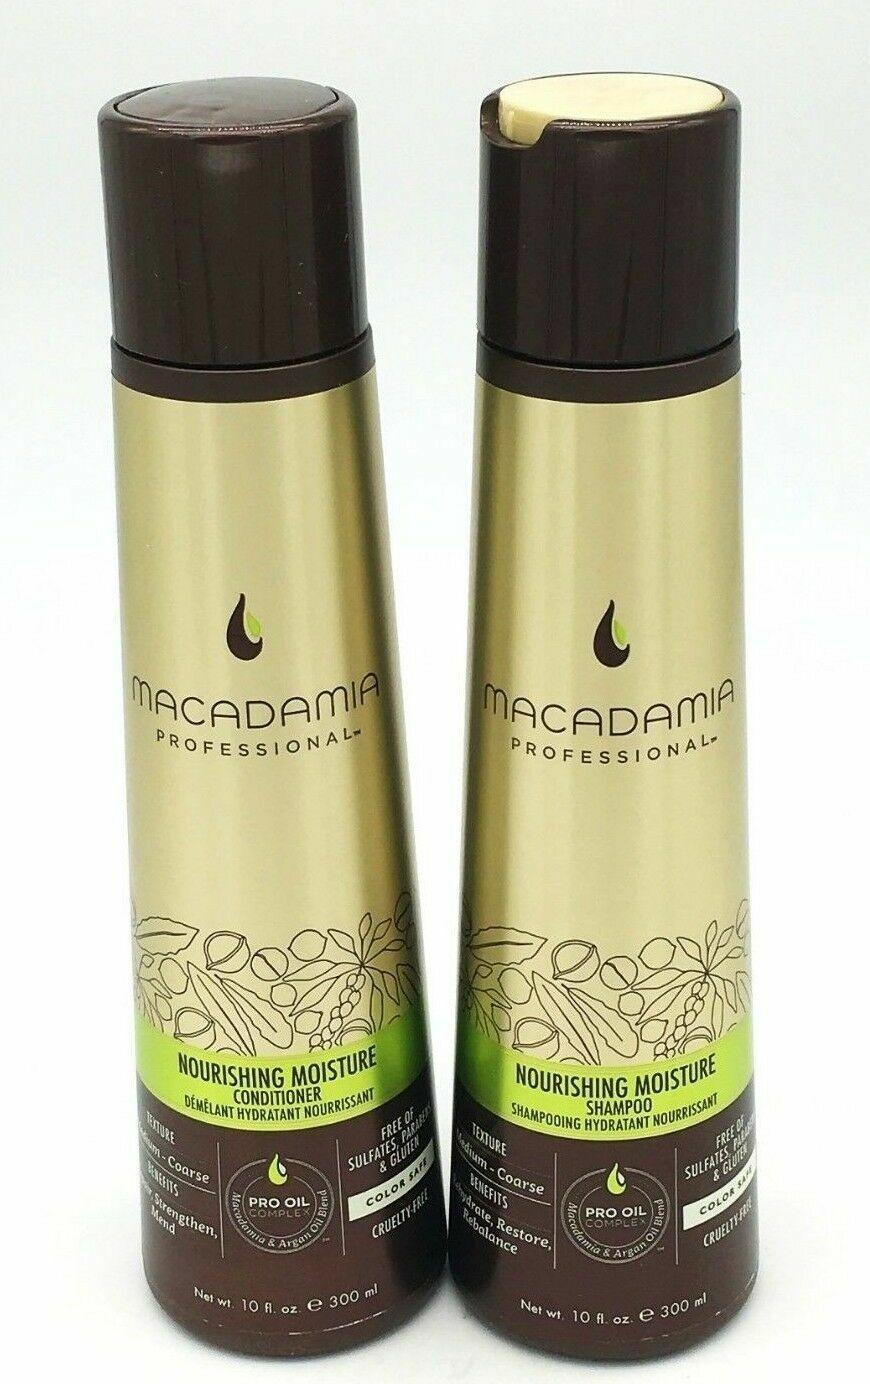 Macadamia Professional Nourishing Moisture Shampoo OR Condit